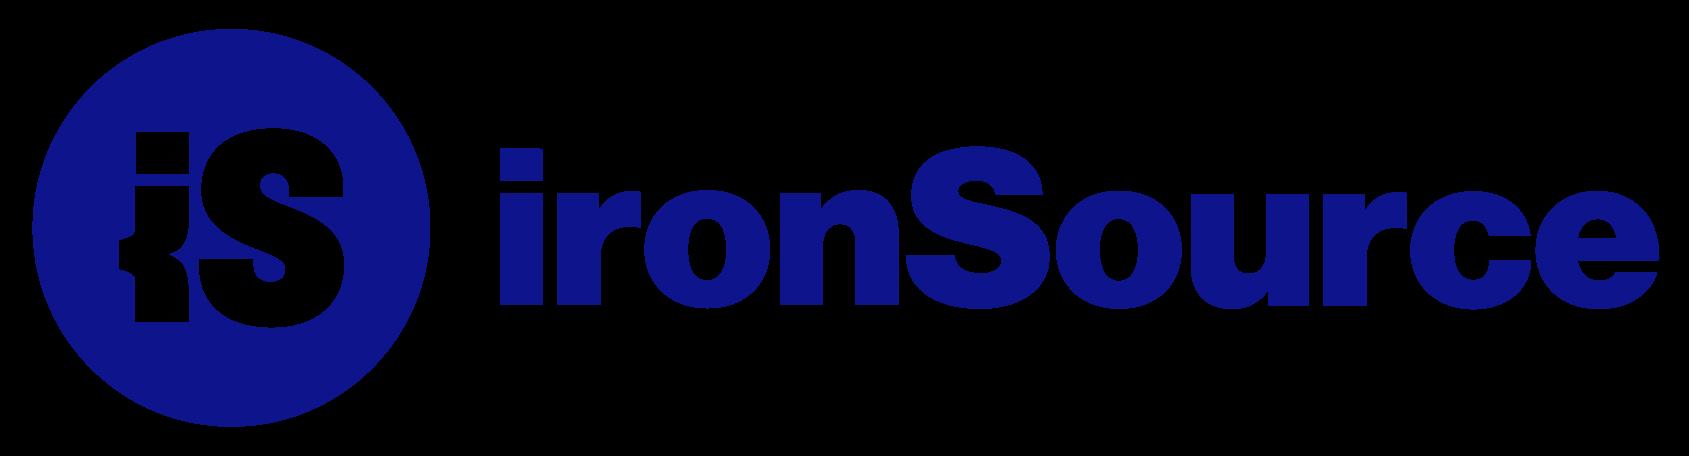 new-logo-blue (4).png